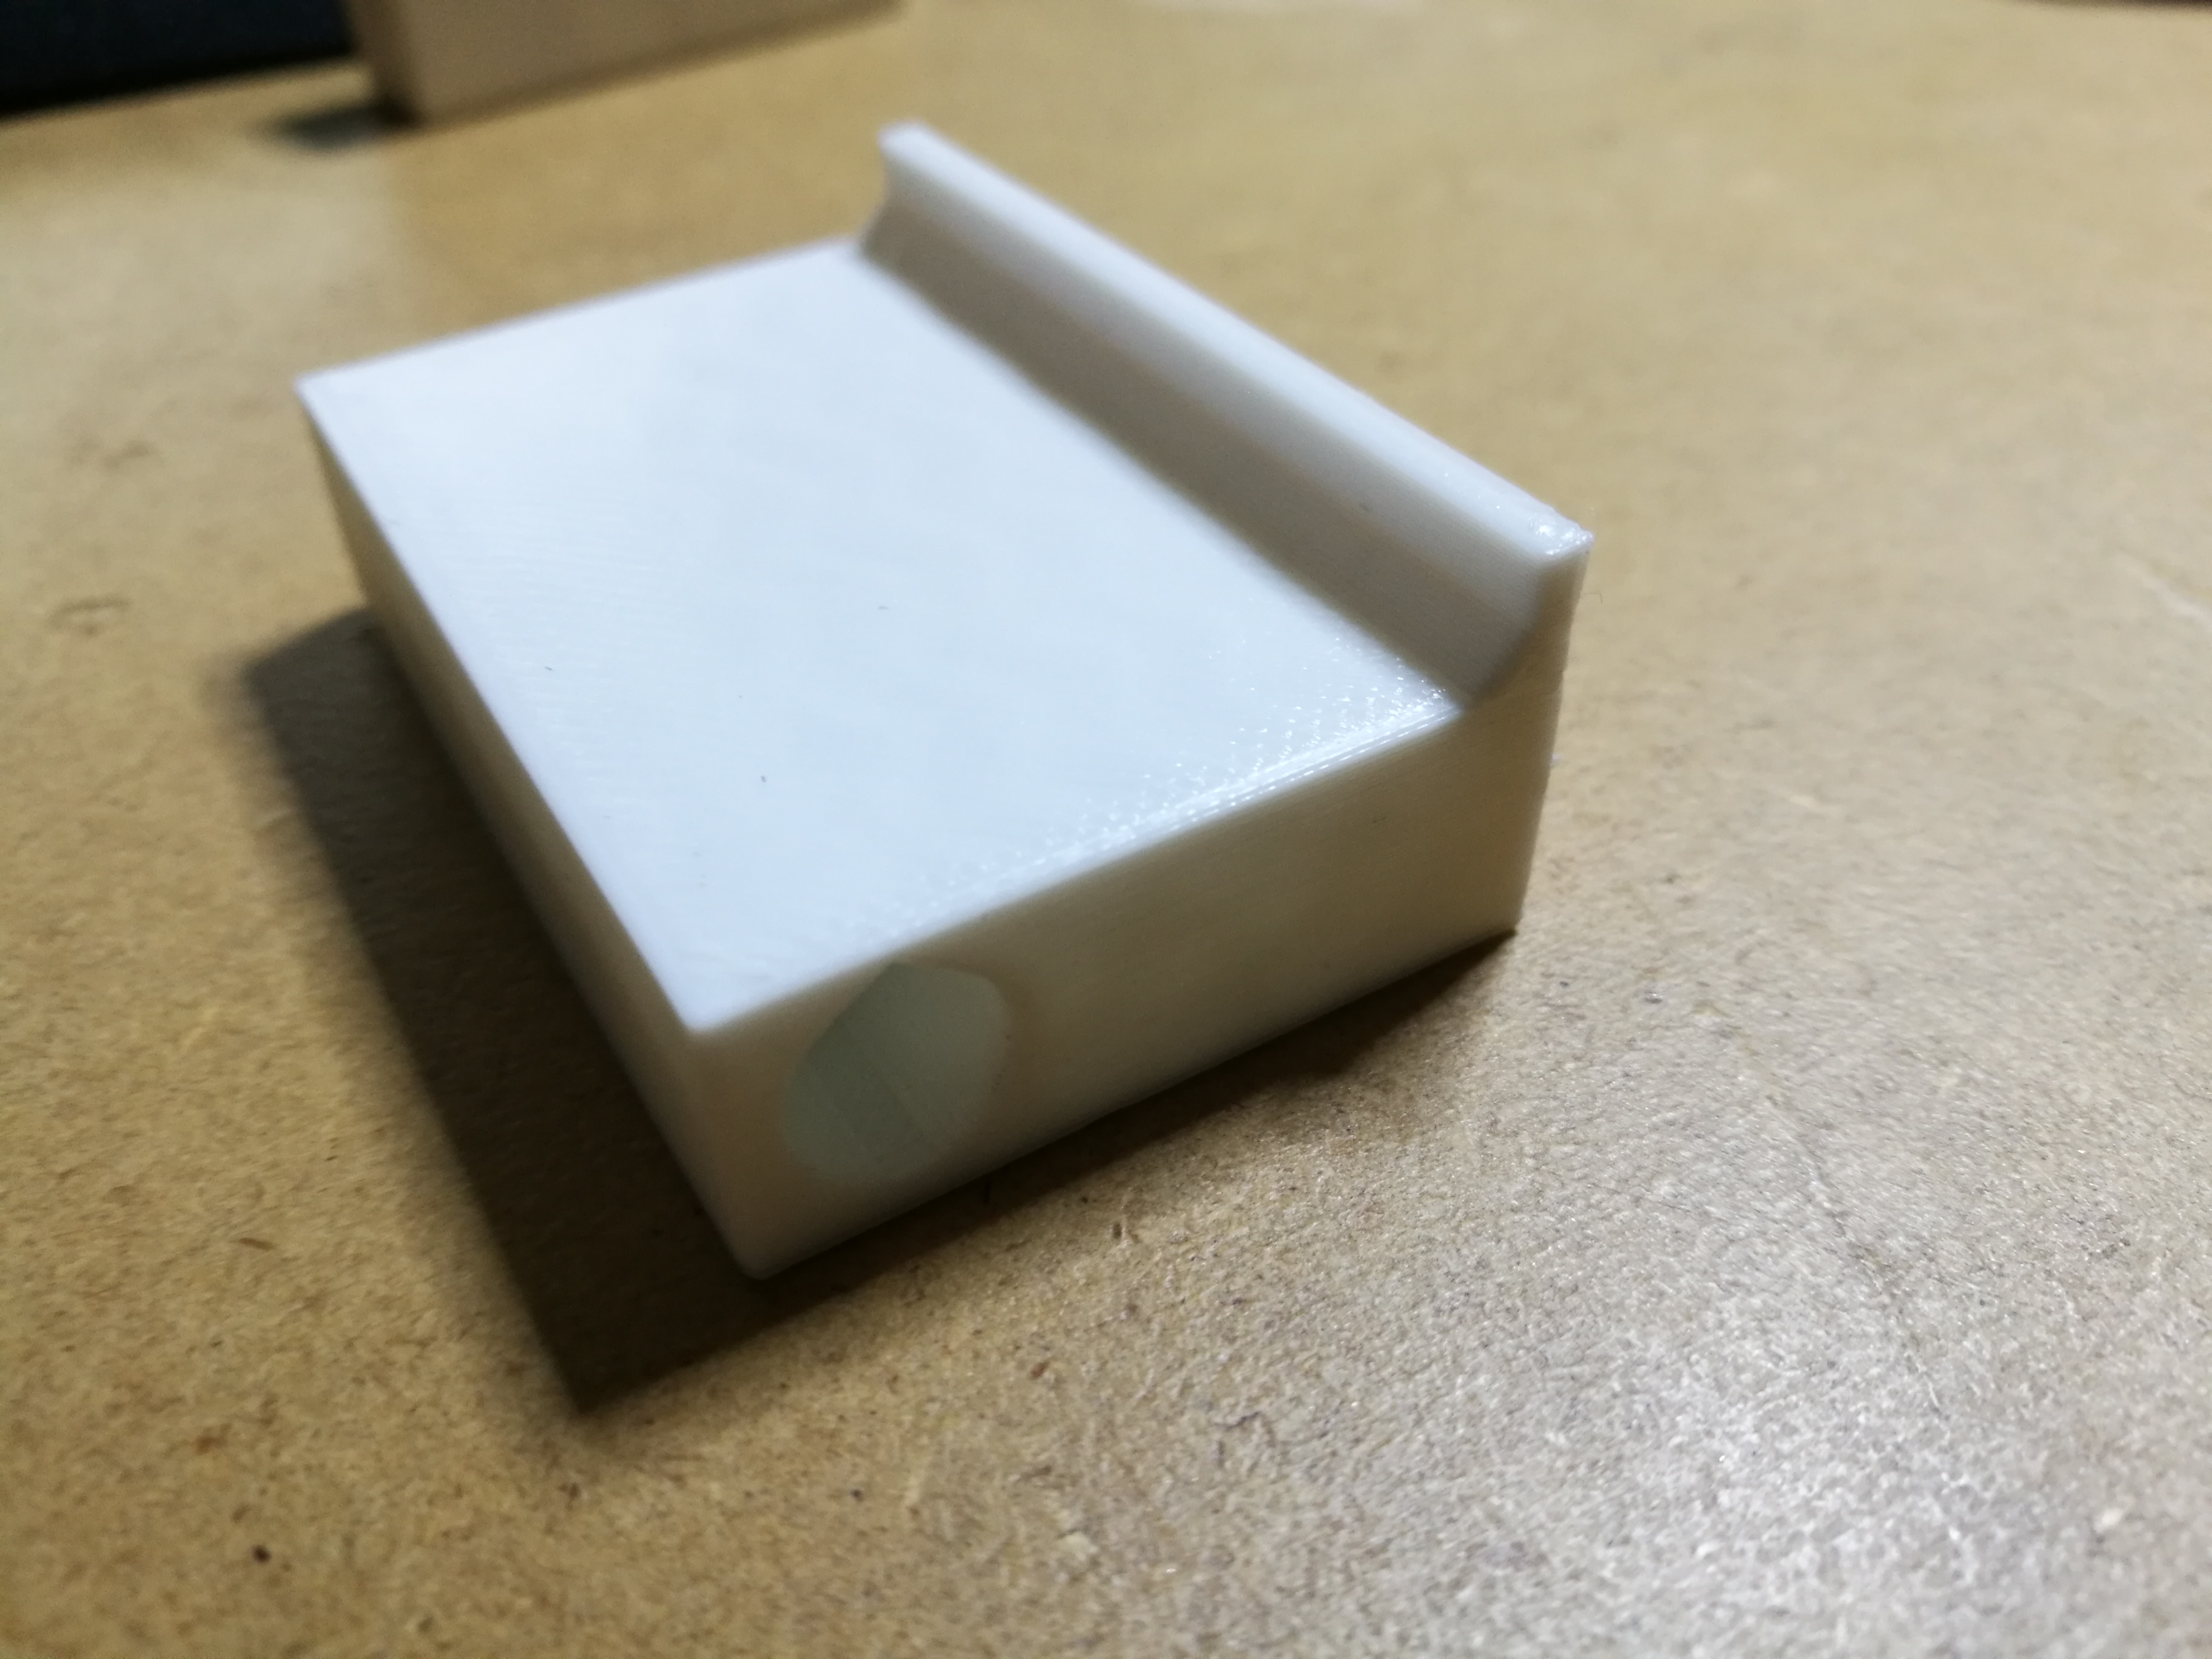 Magnet Holder for Homematic Door Contact by hurr1k4ne